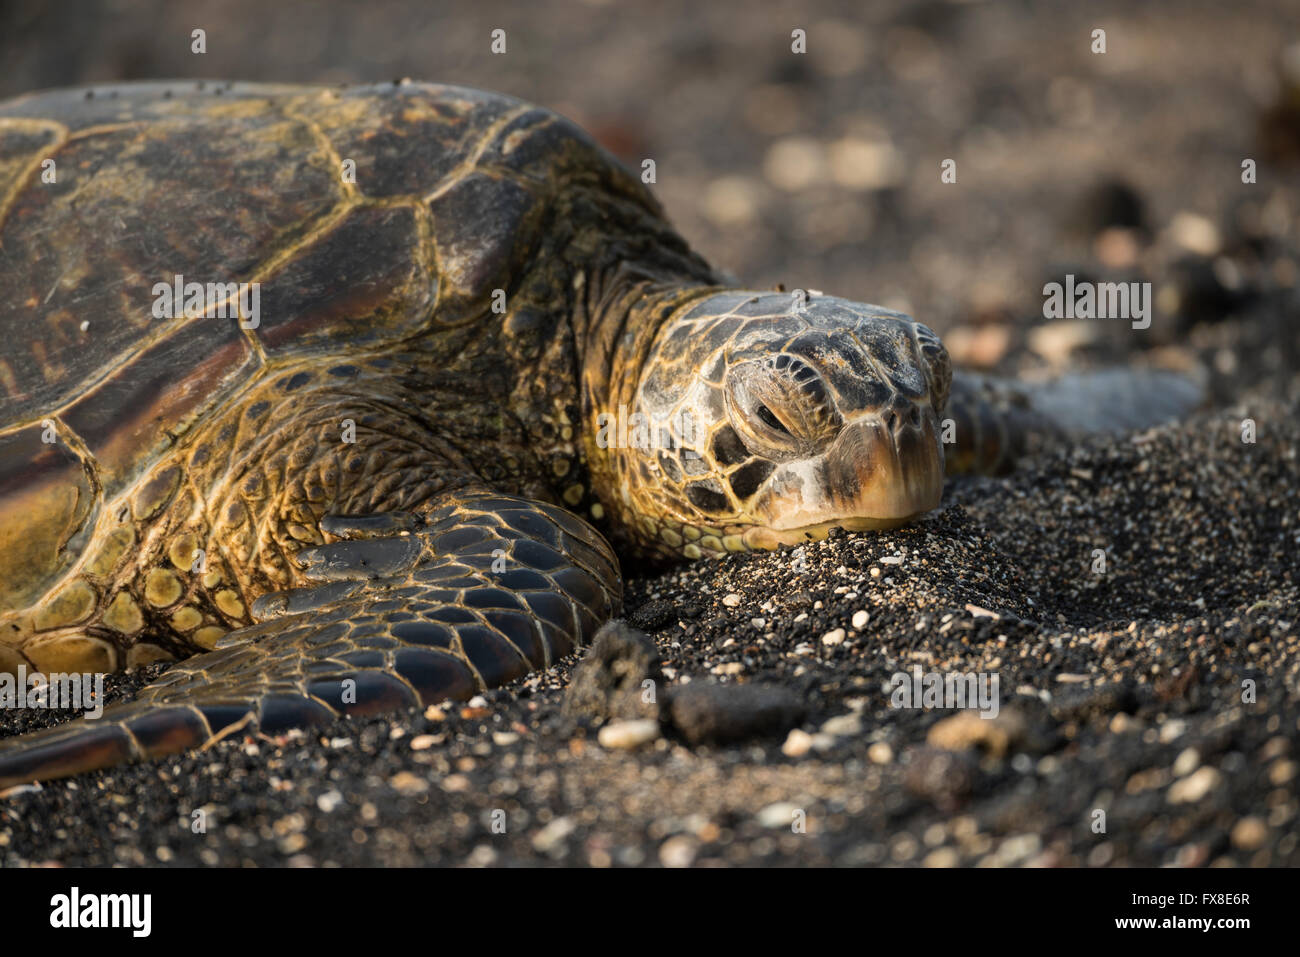 USA, Hawaii, Big Island, Kona, Kaloko-Honokohau historic national park, sea turtle on beach, - Stock Image